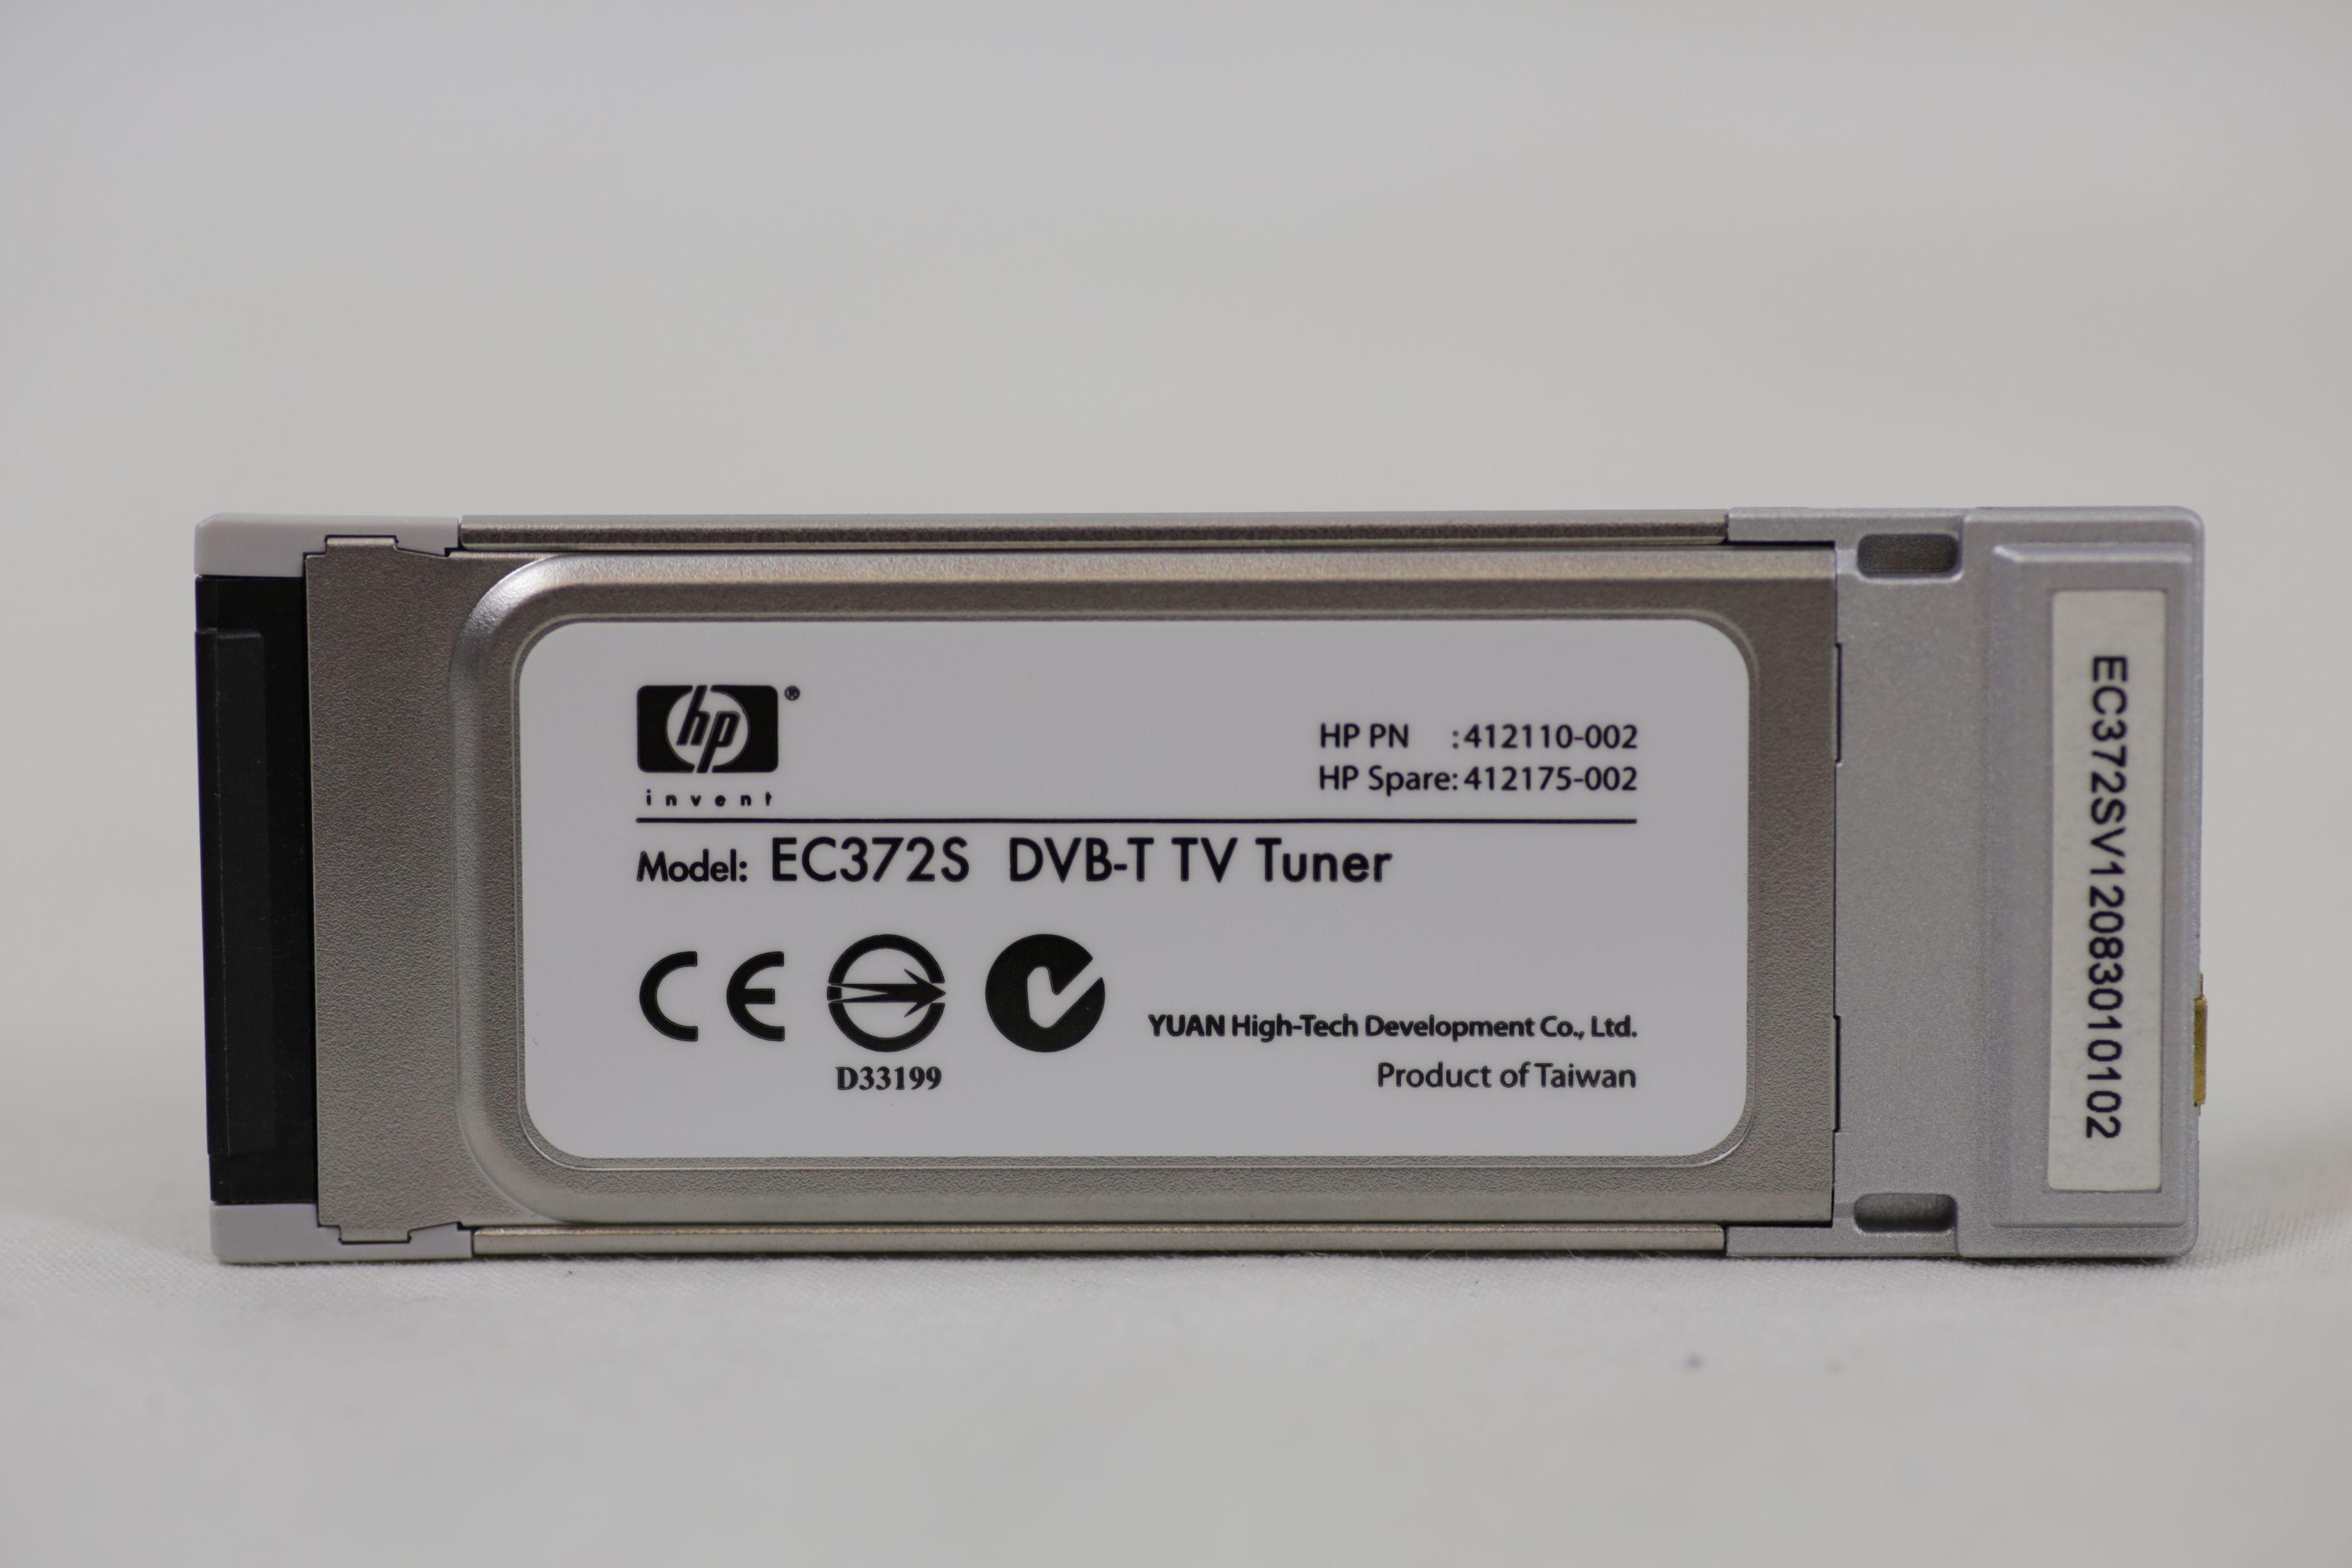 EC372S DVB-T TV TUNER WINDOWS 7 DRIVER